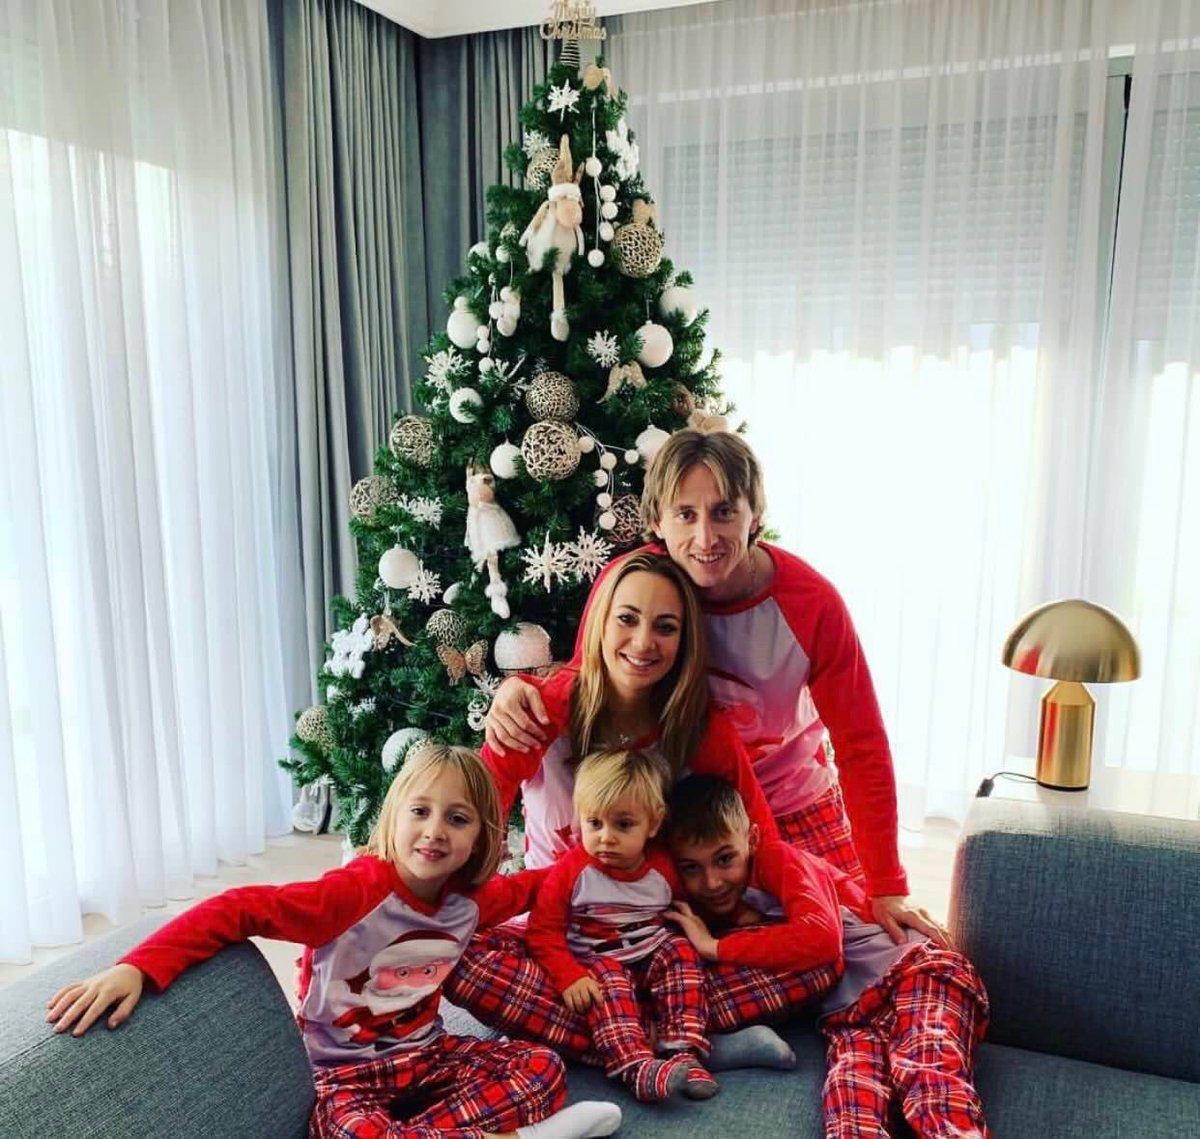 Merry Christmas to everyone 🎅🏻🌲❤️ #Family